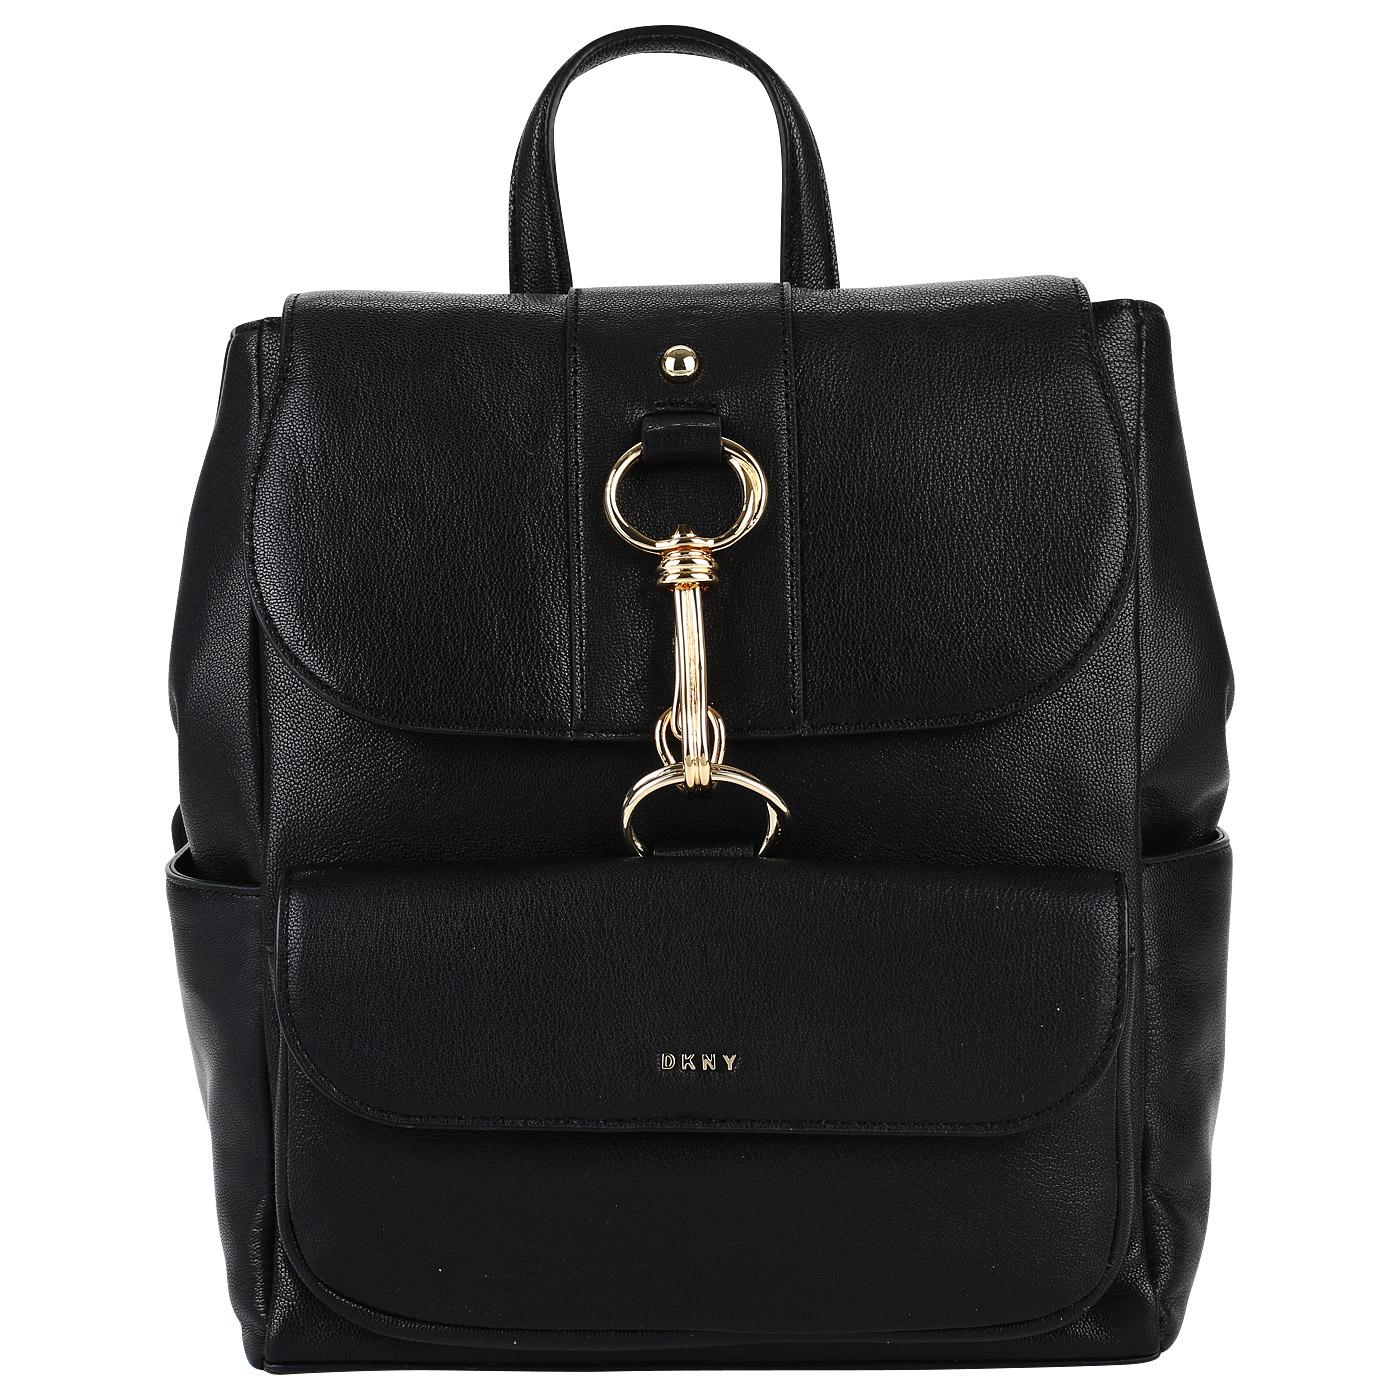 66017f7216fc Кожаный рюкзак DKNY Randall R81KC431-BLK - 2000557874657 черный ...